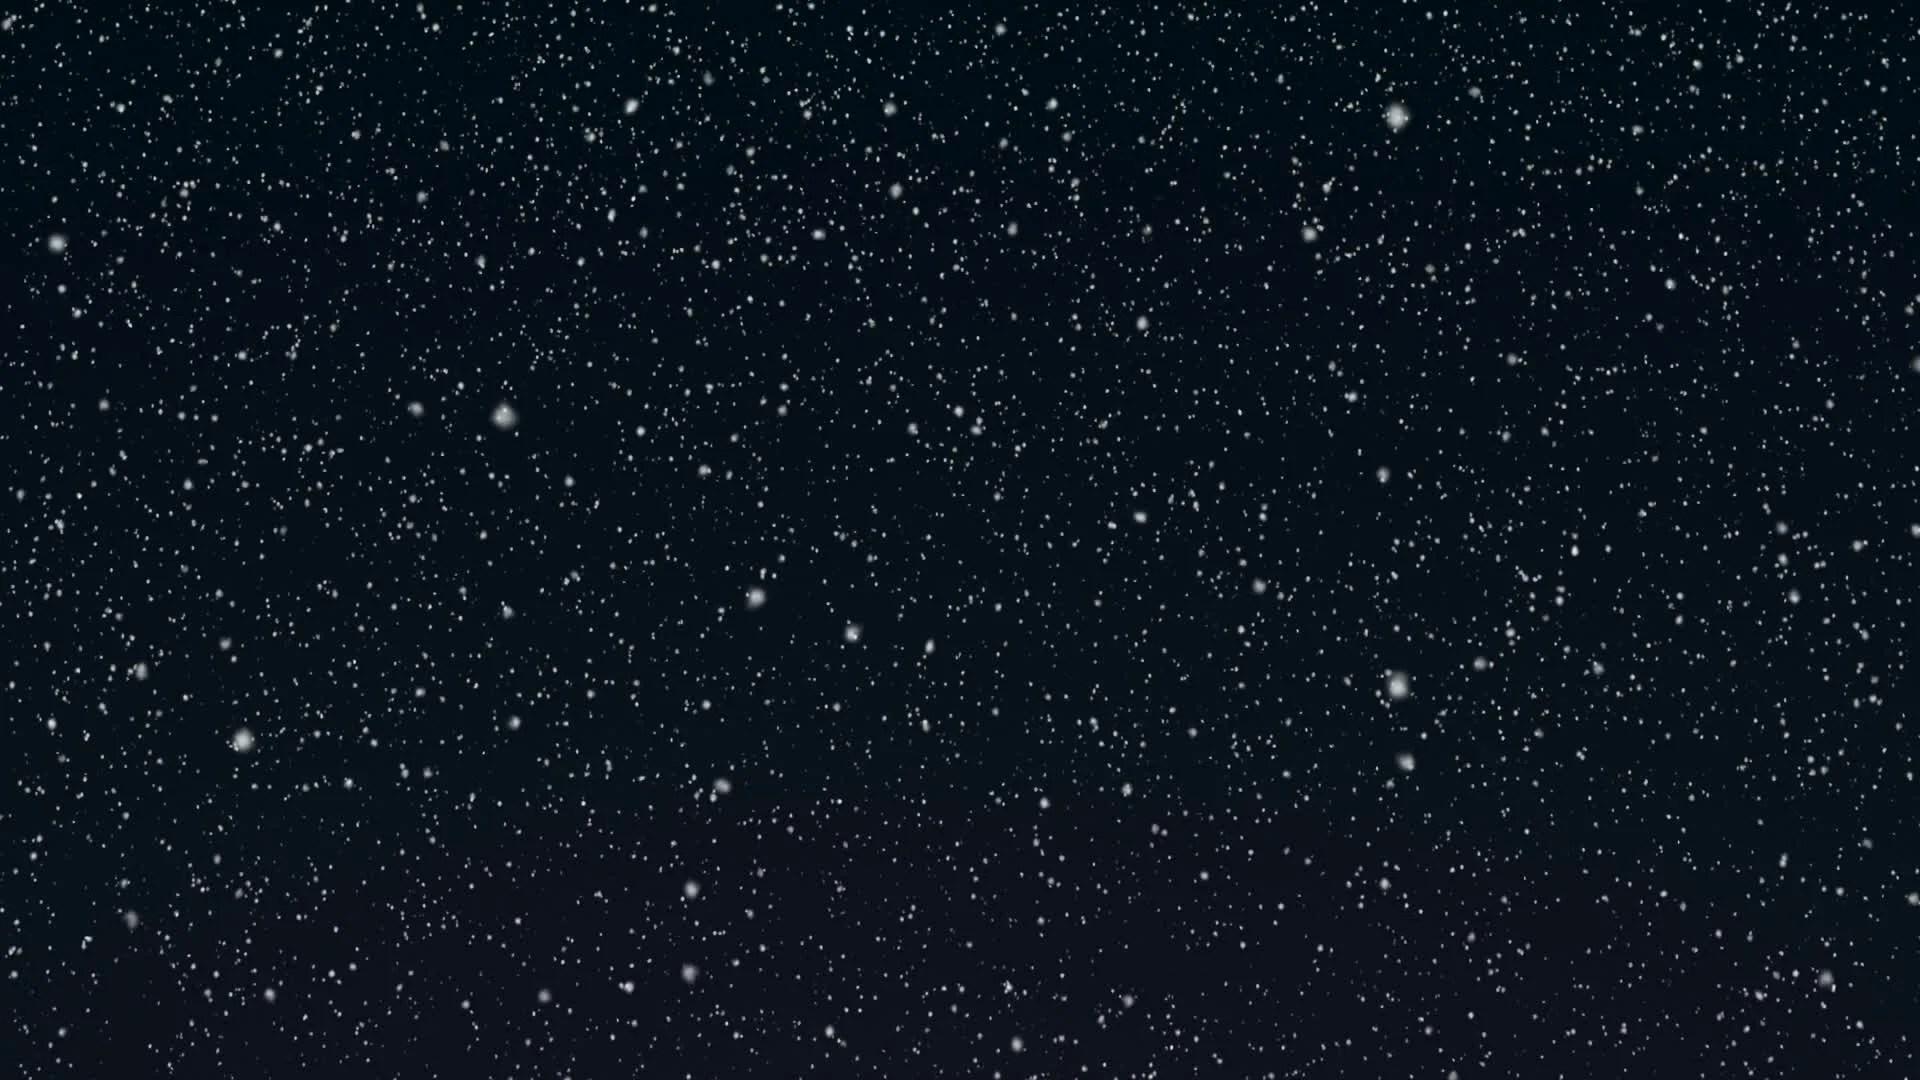 Free Falling Snow Wallpaper Snowy3 Gently Falling Snow Video Background Loop